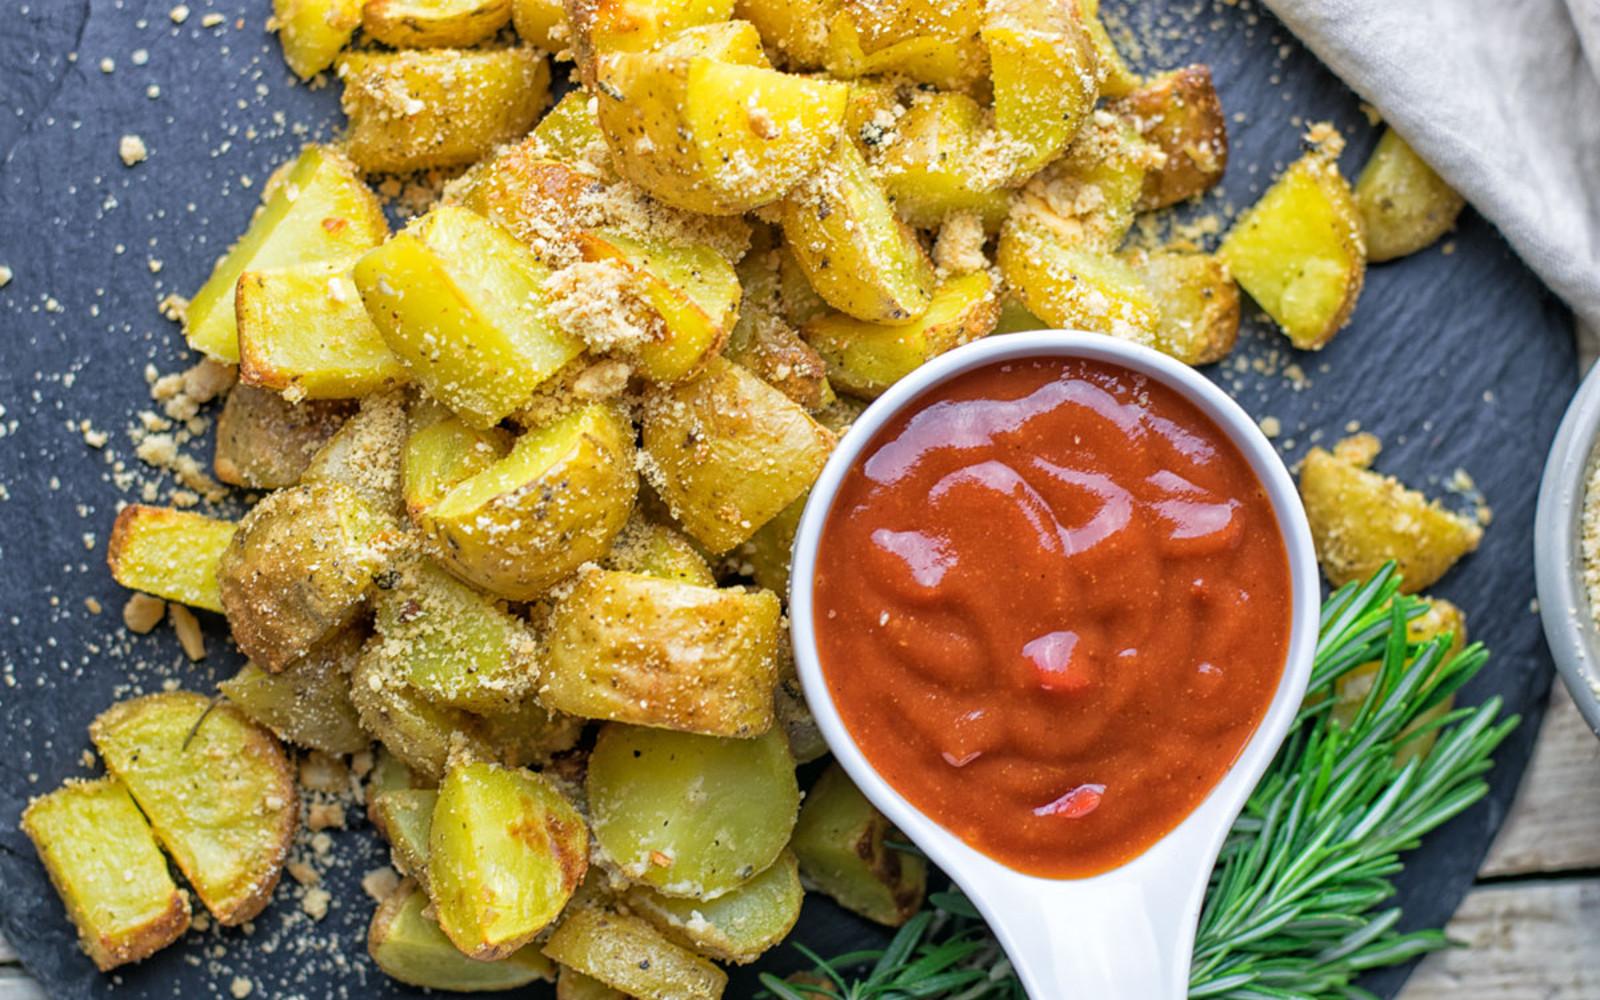 Garlic Parmesan Potatoes